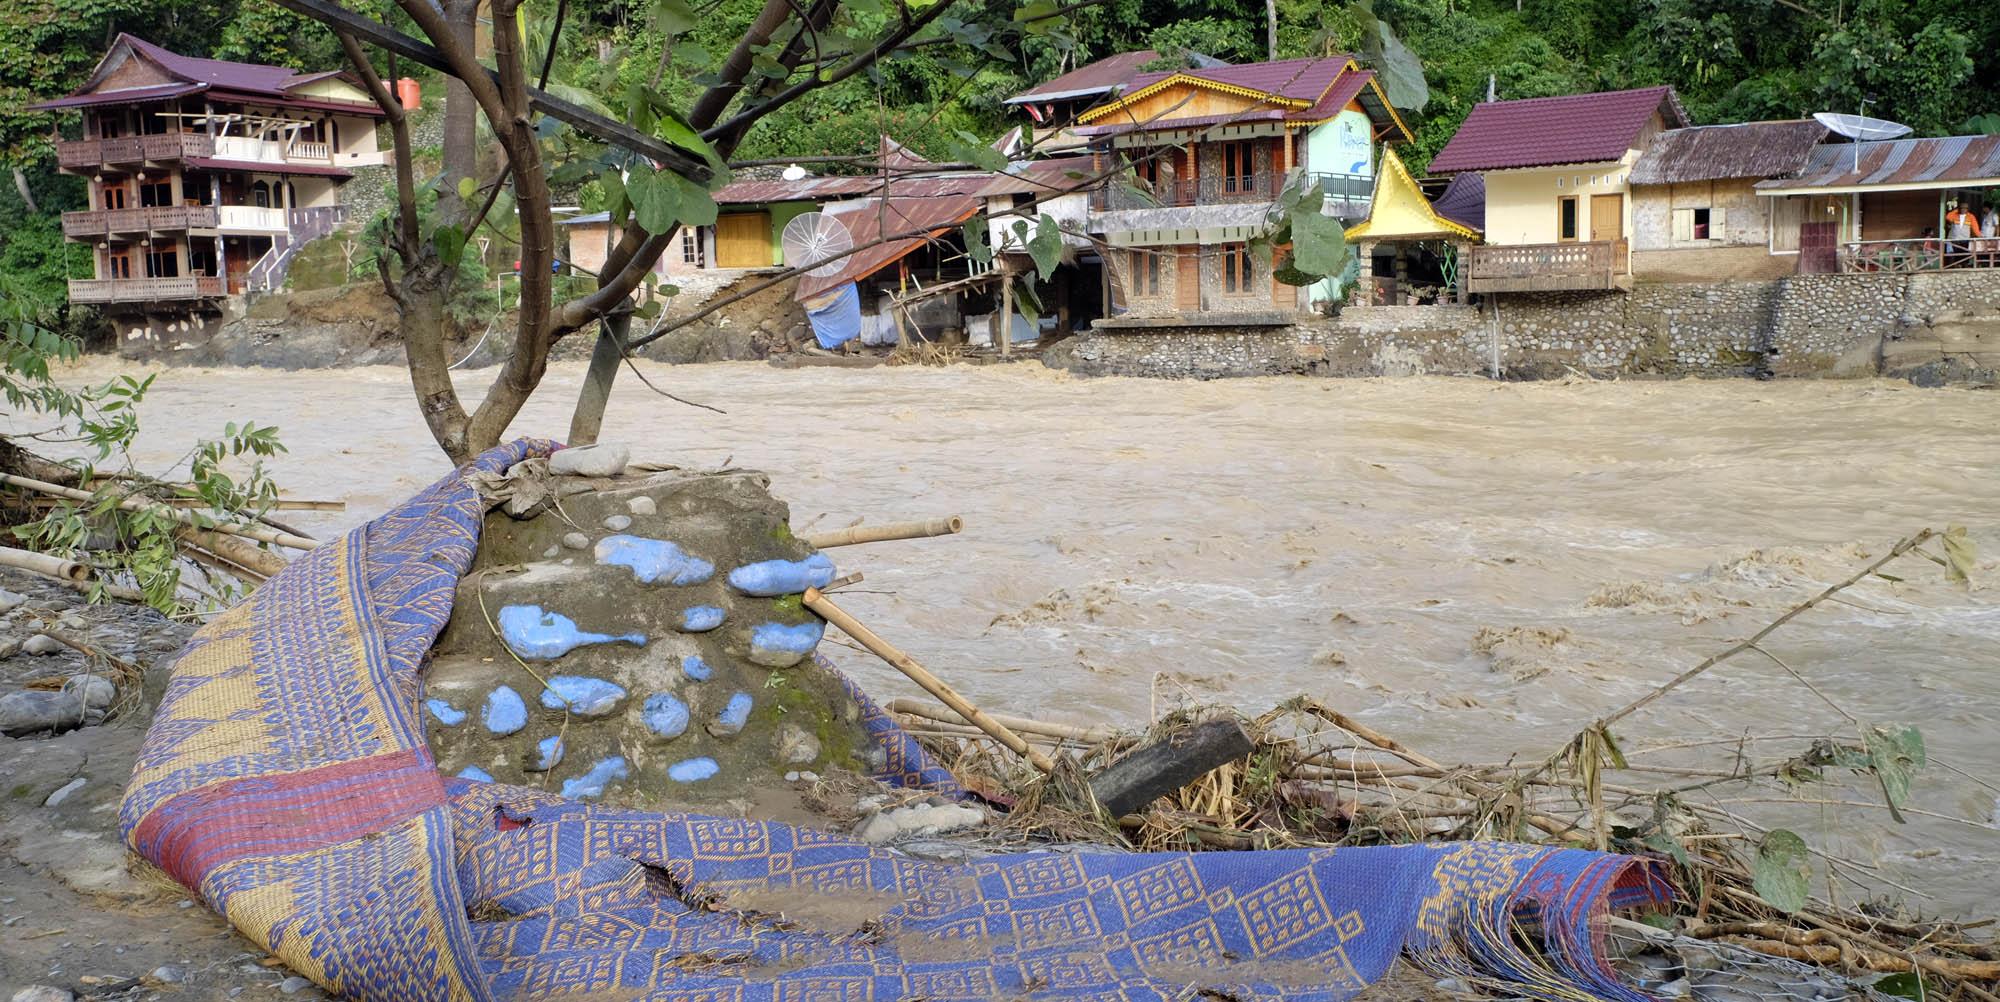 reise-ansichten Bukt Lawang Flut